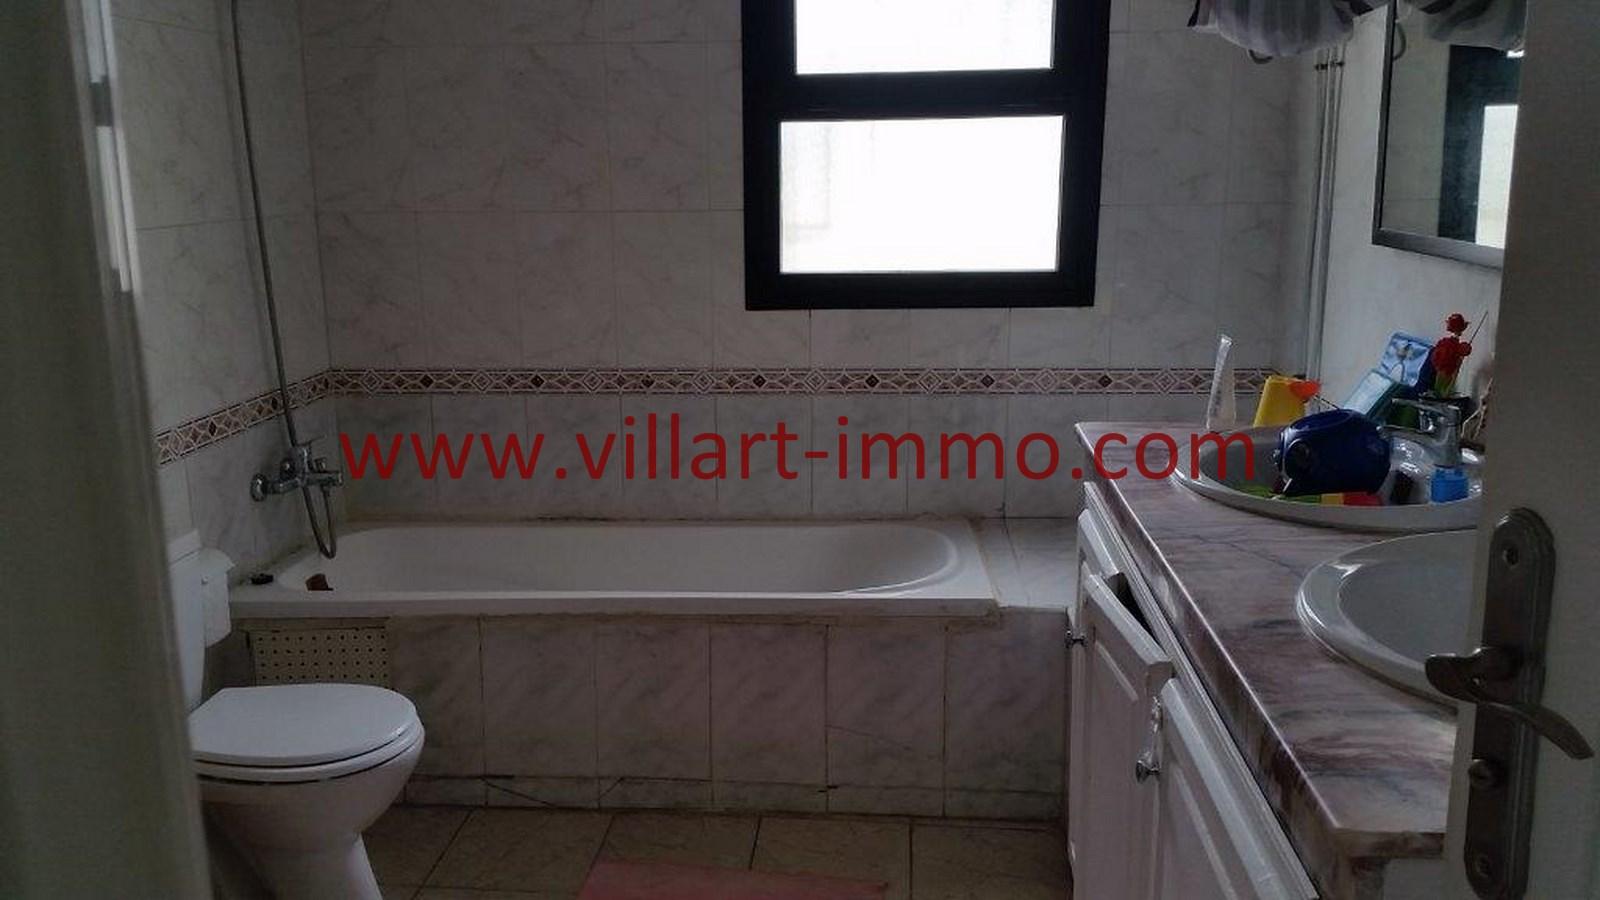 12-a-vendre-tanger-villa-californie-salle-de-bain-2-vv459-villart-immo-agence-immobiliere